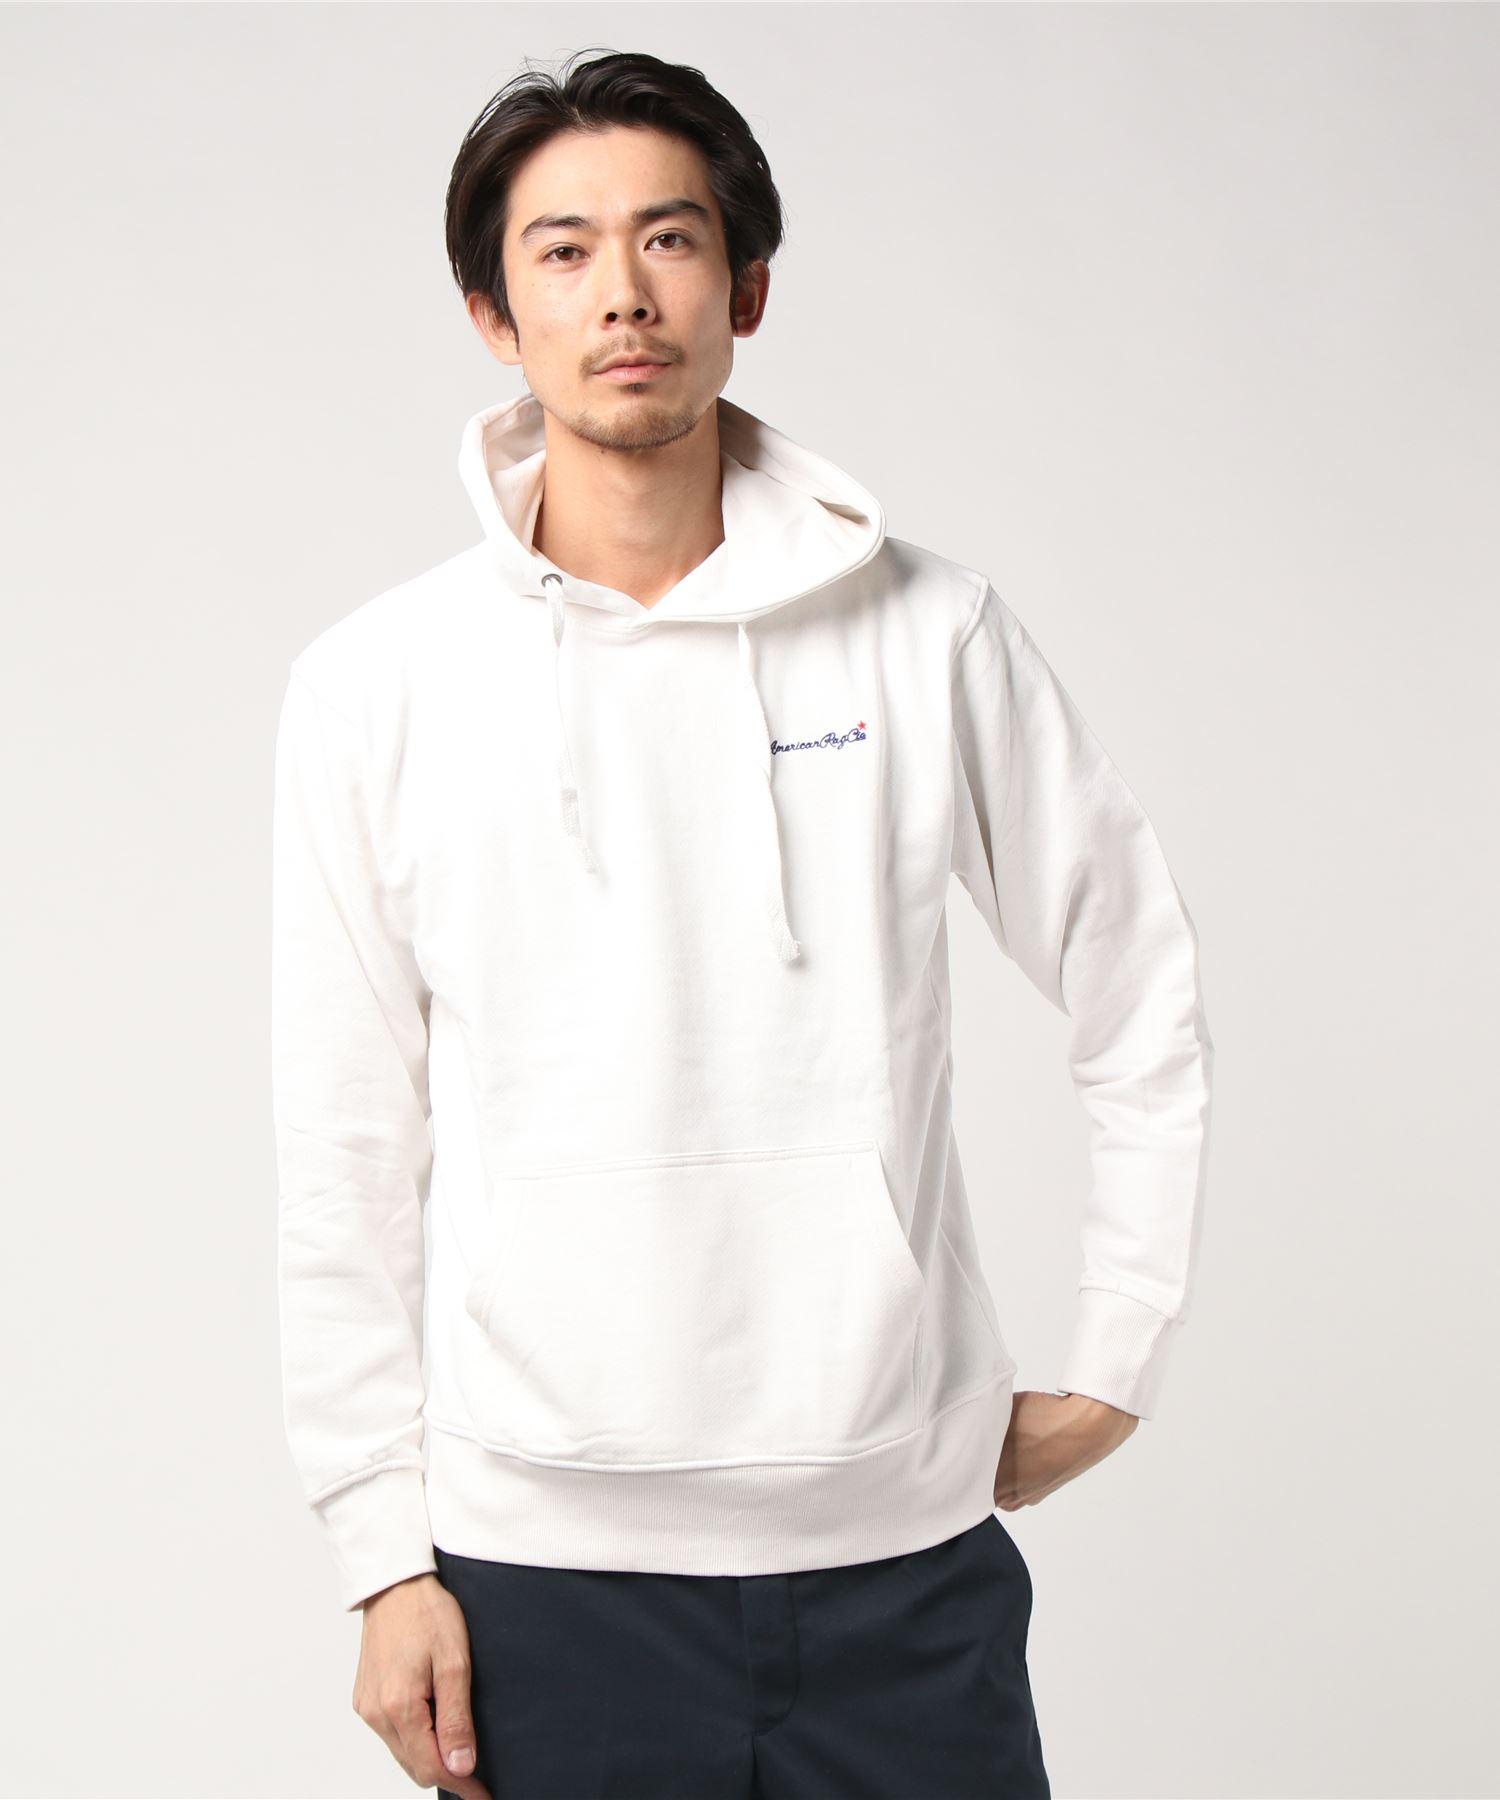 AMERICAN RAG CIE ARC Script Logo Embroidery Hooded Sweatshirt/アメリカンラグシー ARCスクリプトロゴエンブロイダリーフードパーカ